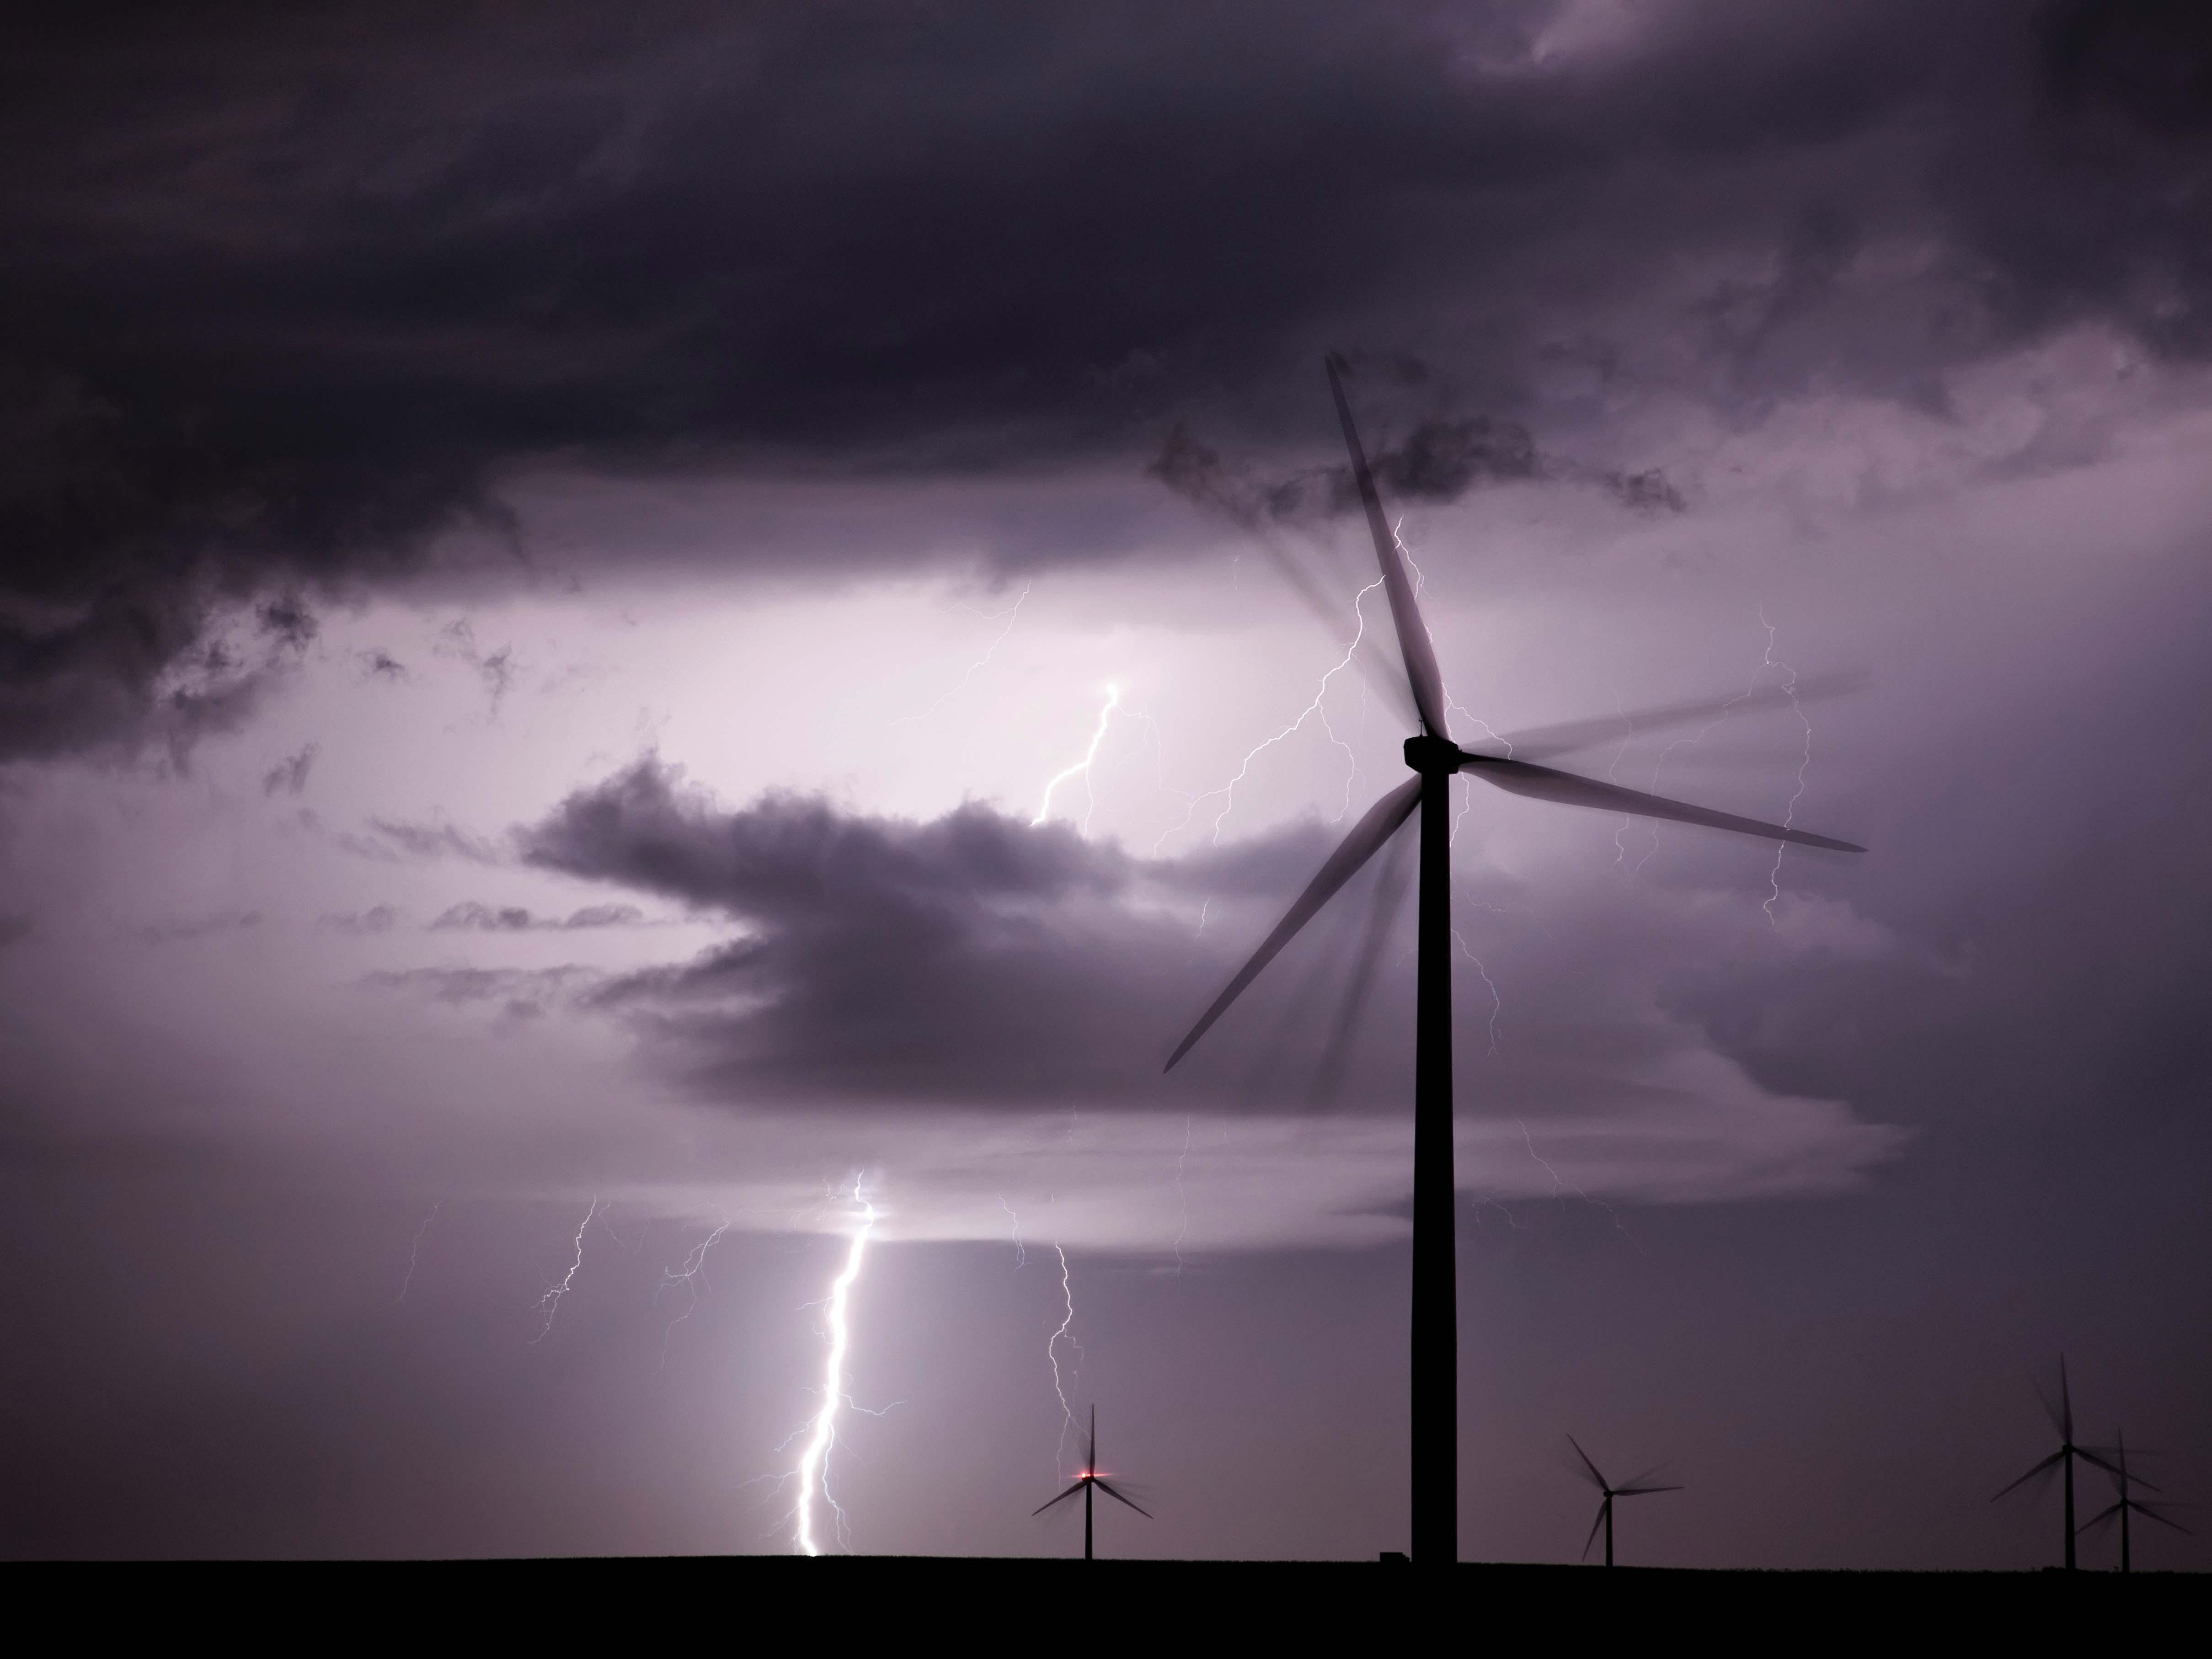 wind turbine near a lightning strike